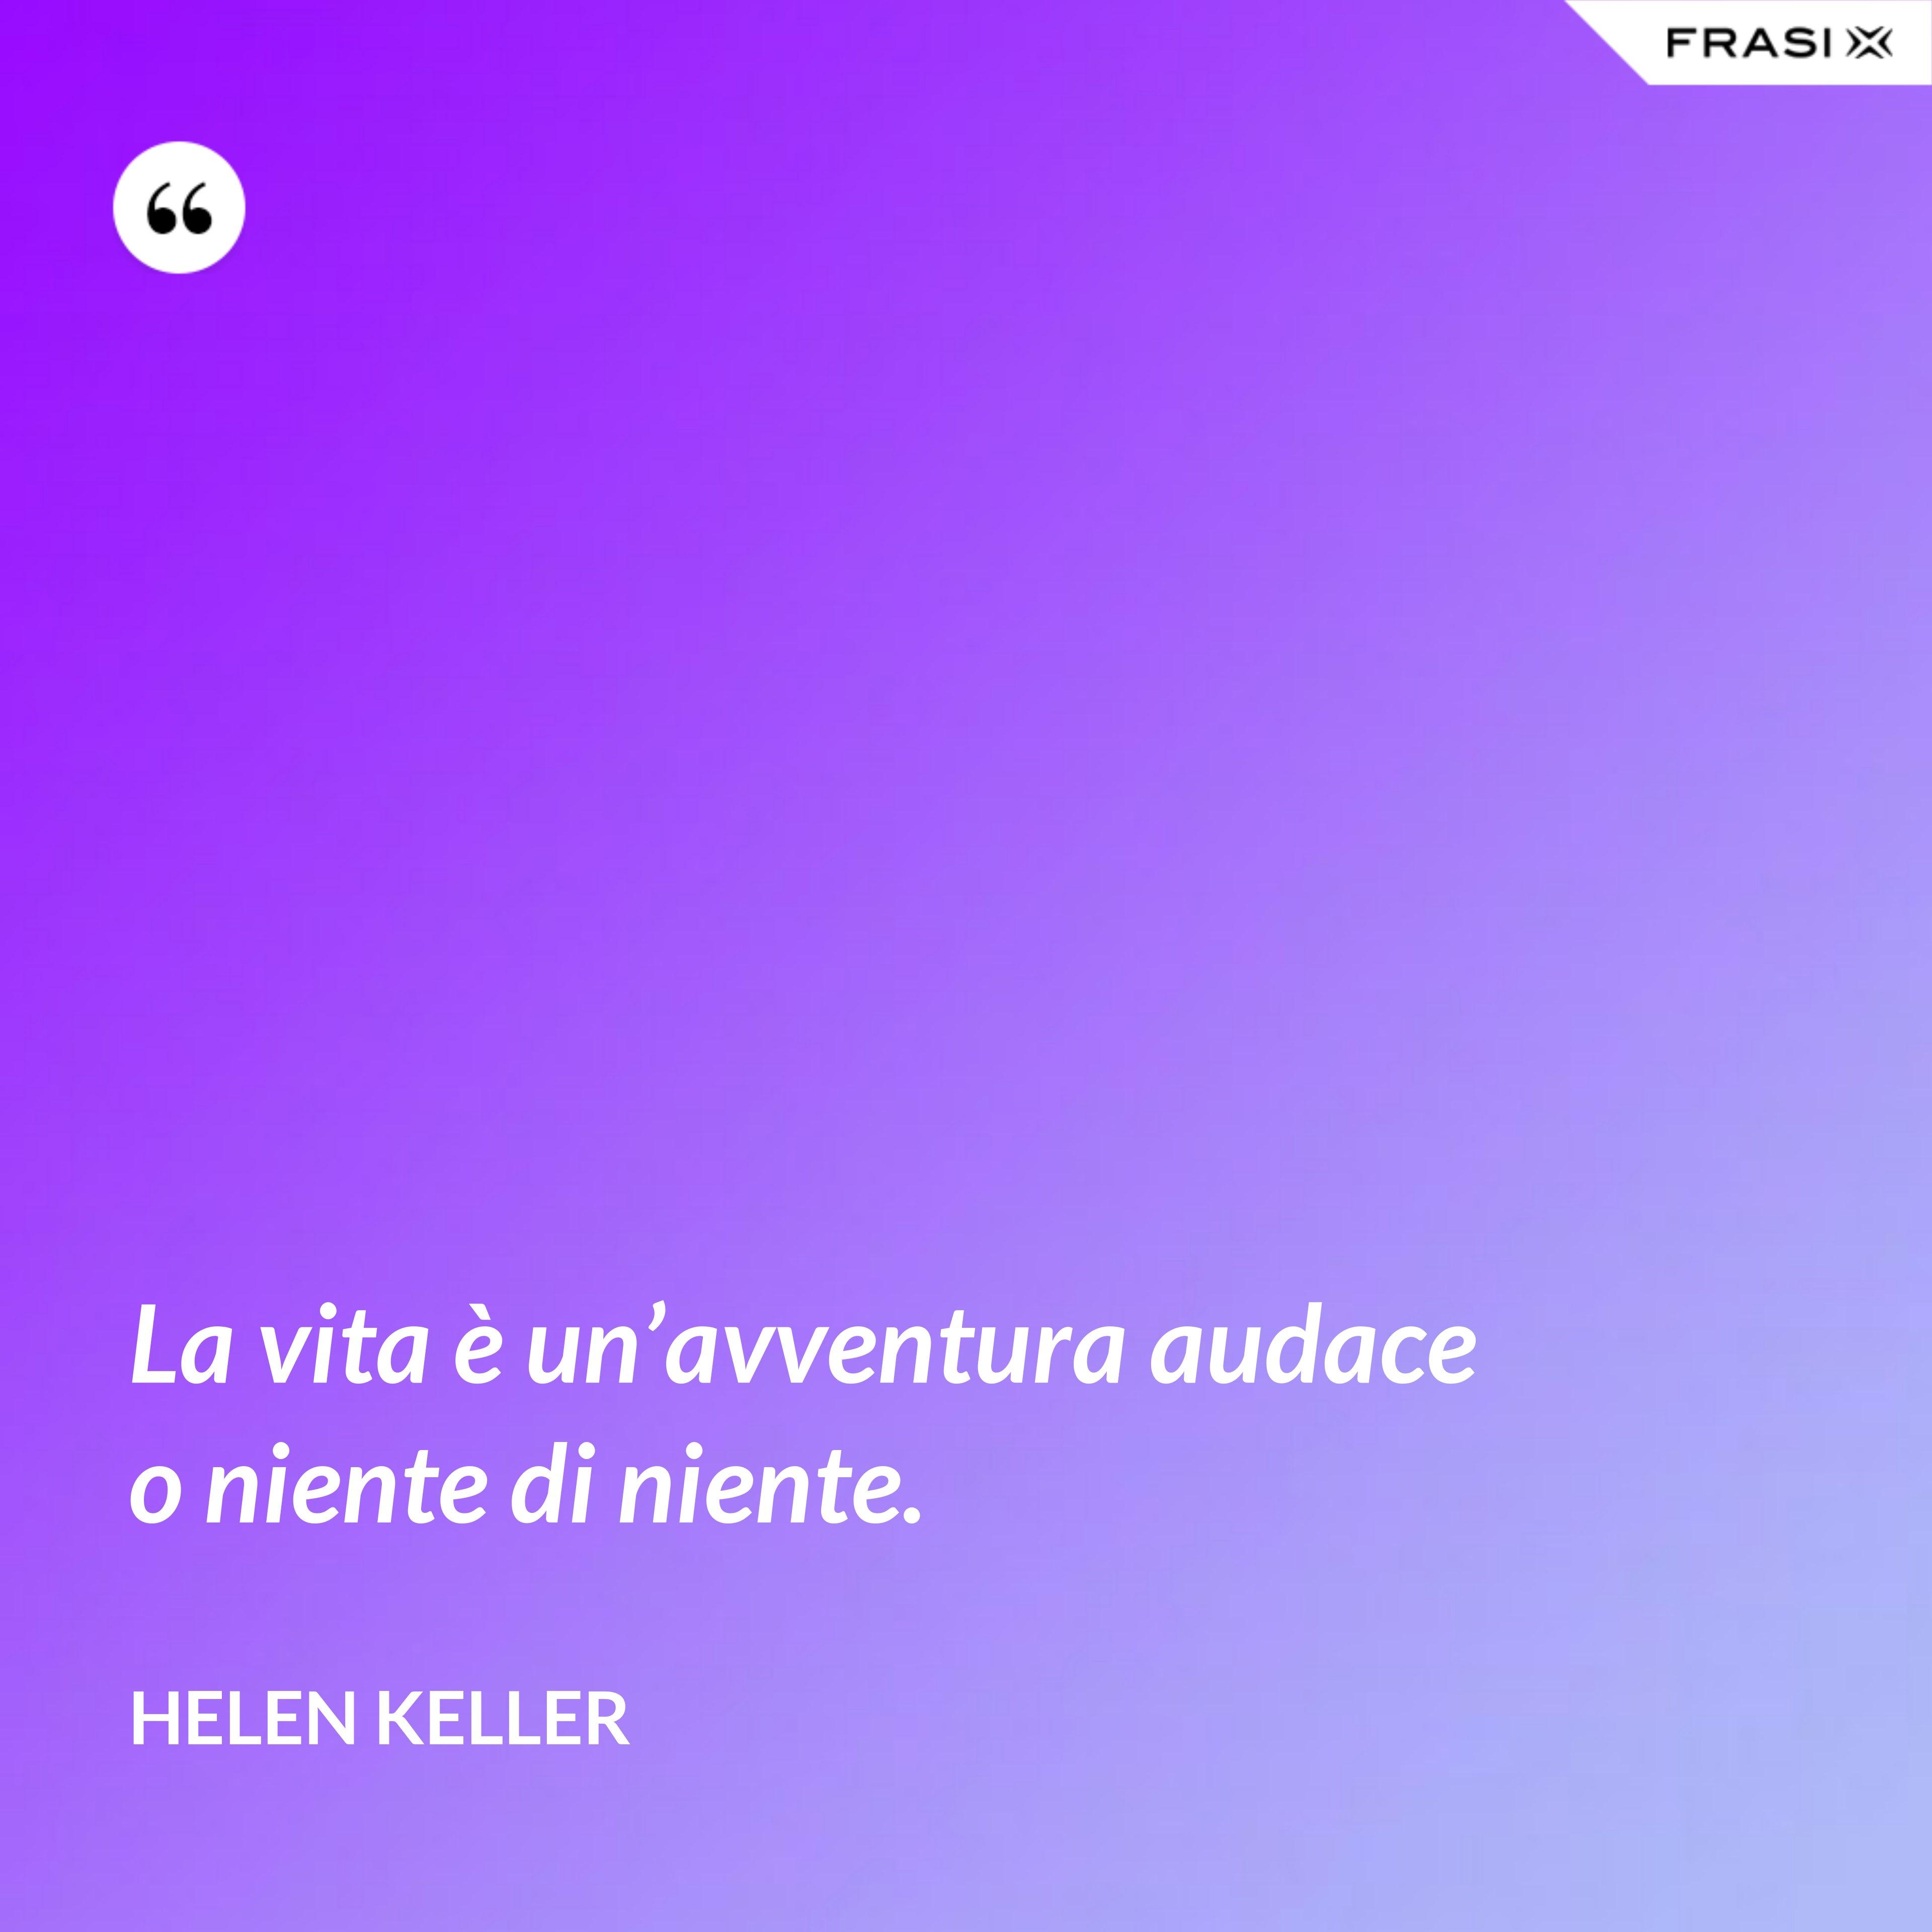 La vita è un'avventura audace o niente di niente. - Helen Keller